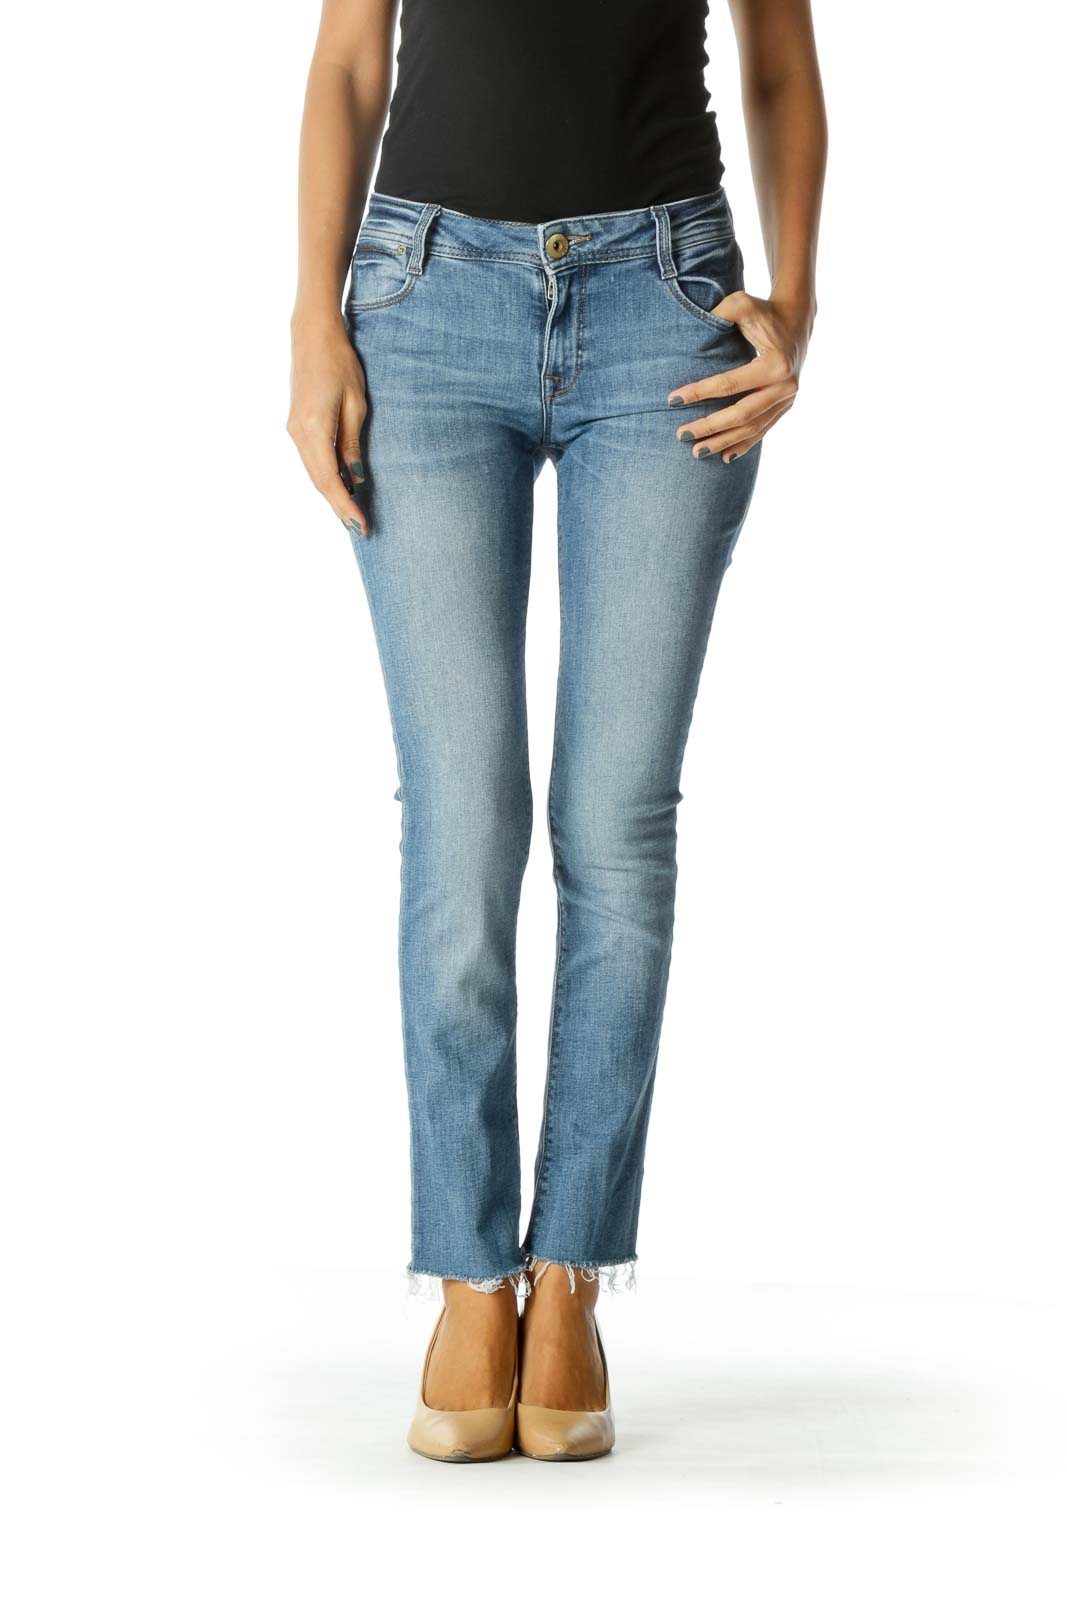 Blue Light Wash Stretch High Rise Raw Hem Denim Jeans Front